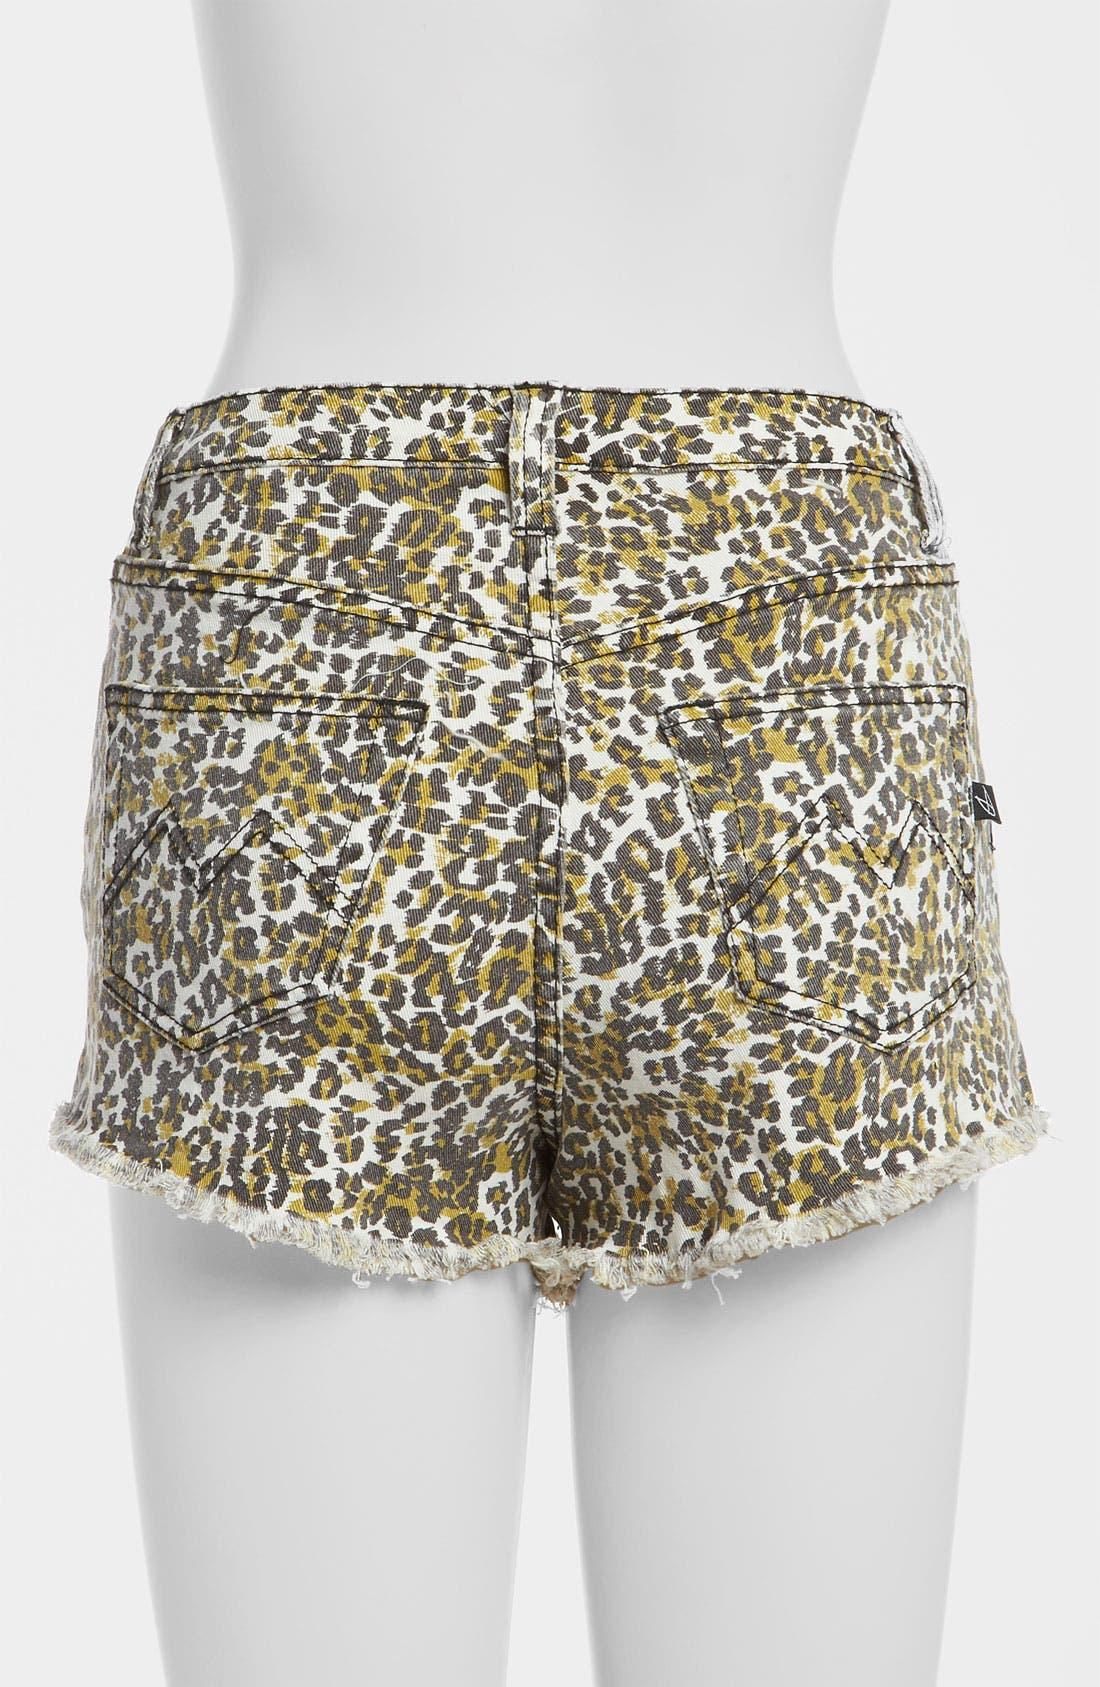 Alternate Image 3  - MINKPINK 'Runaway Leopard' Slash Shorts